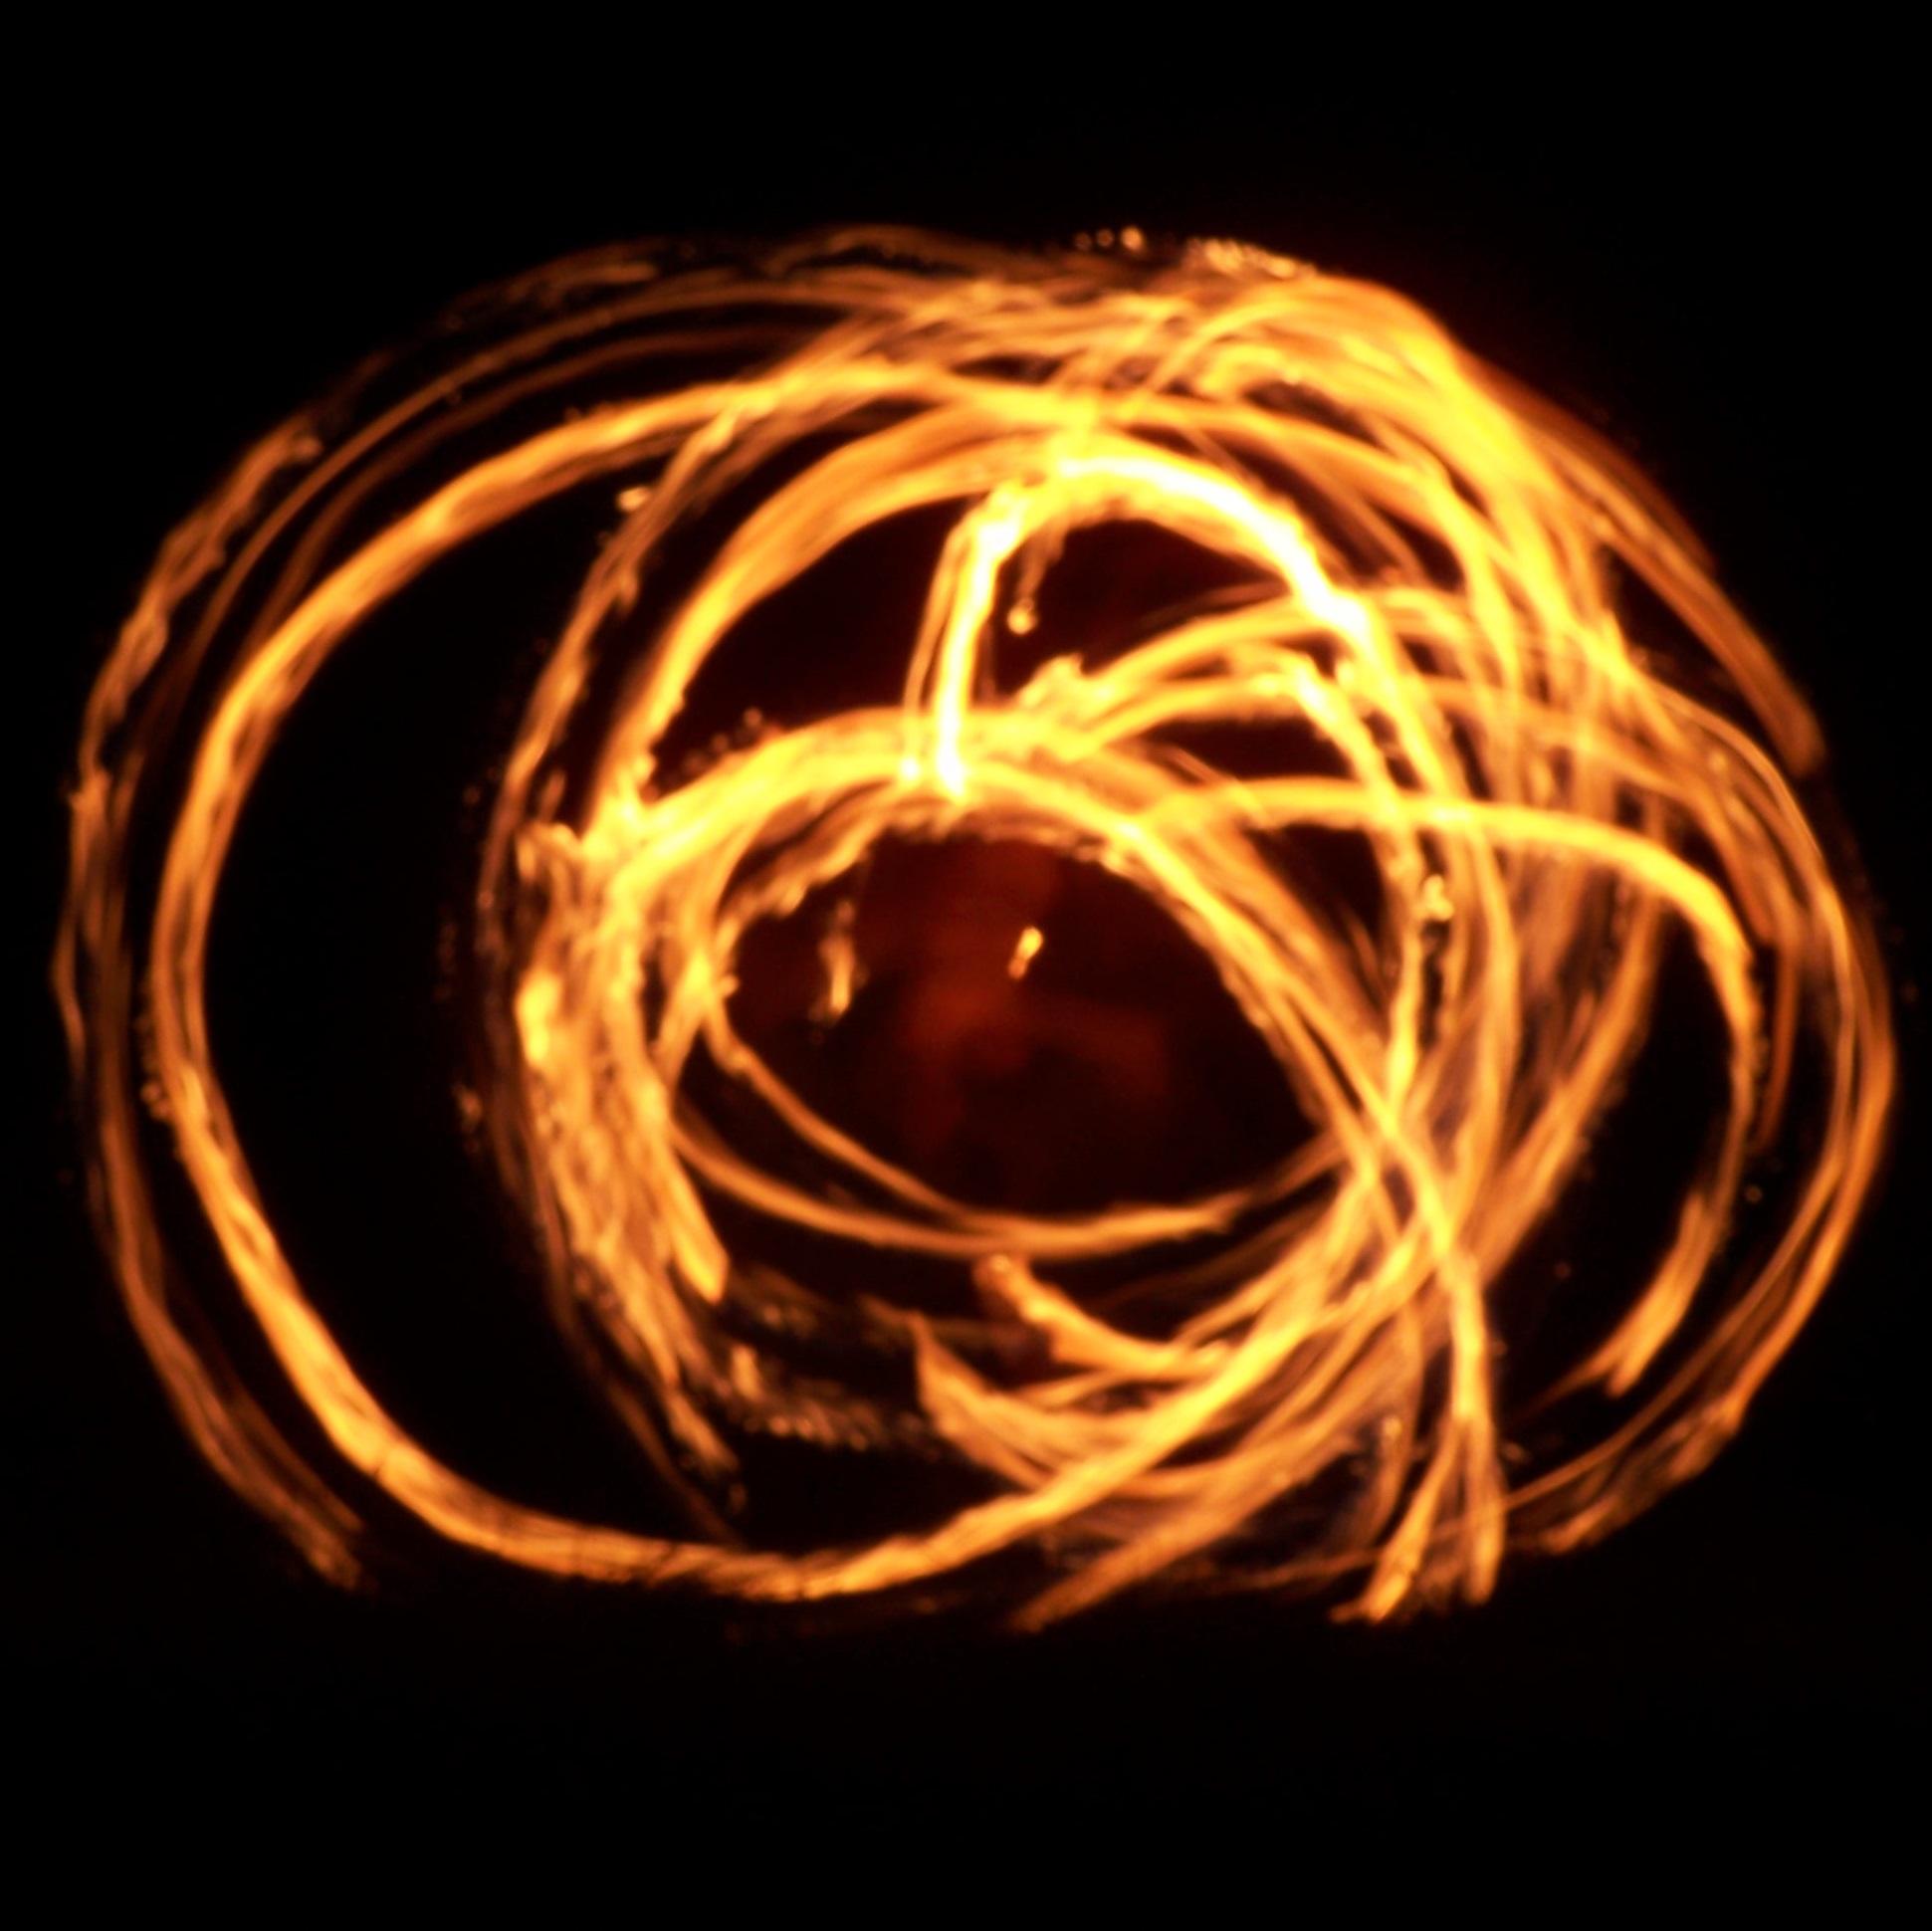 "<h3><a class=""Bildmenue""  href=""https://www.jonglierwerk.de/feuerwerk"">FeuerWerk</a></h3>"